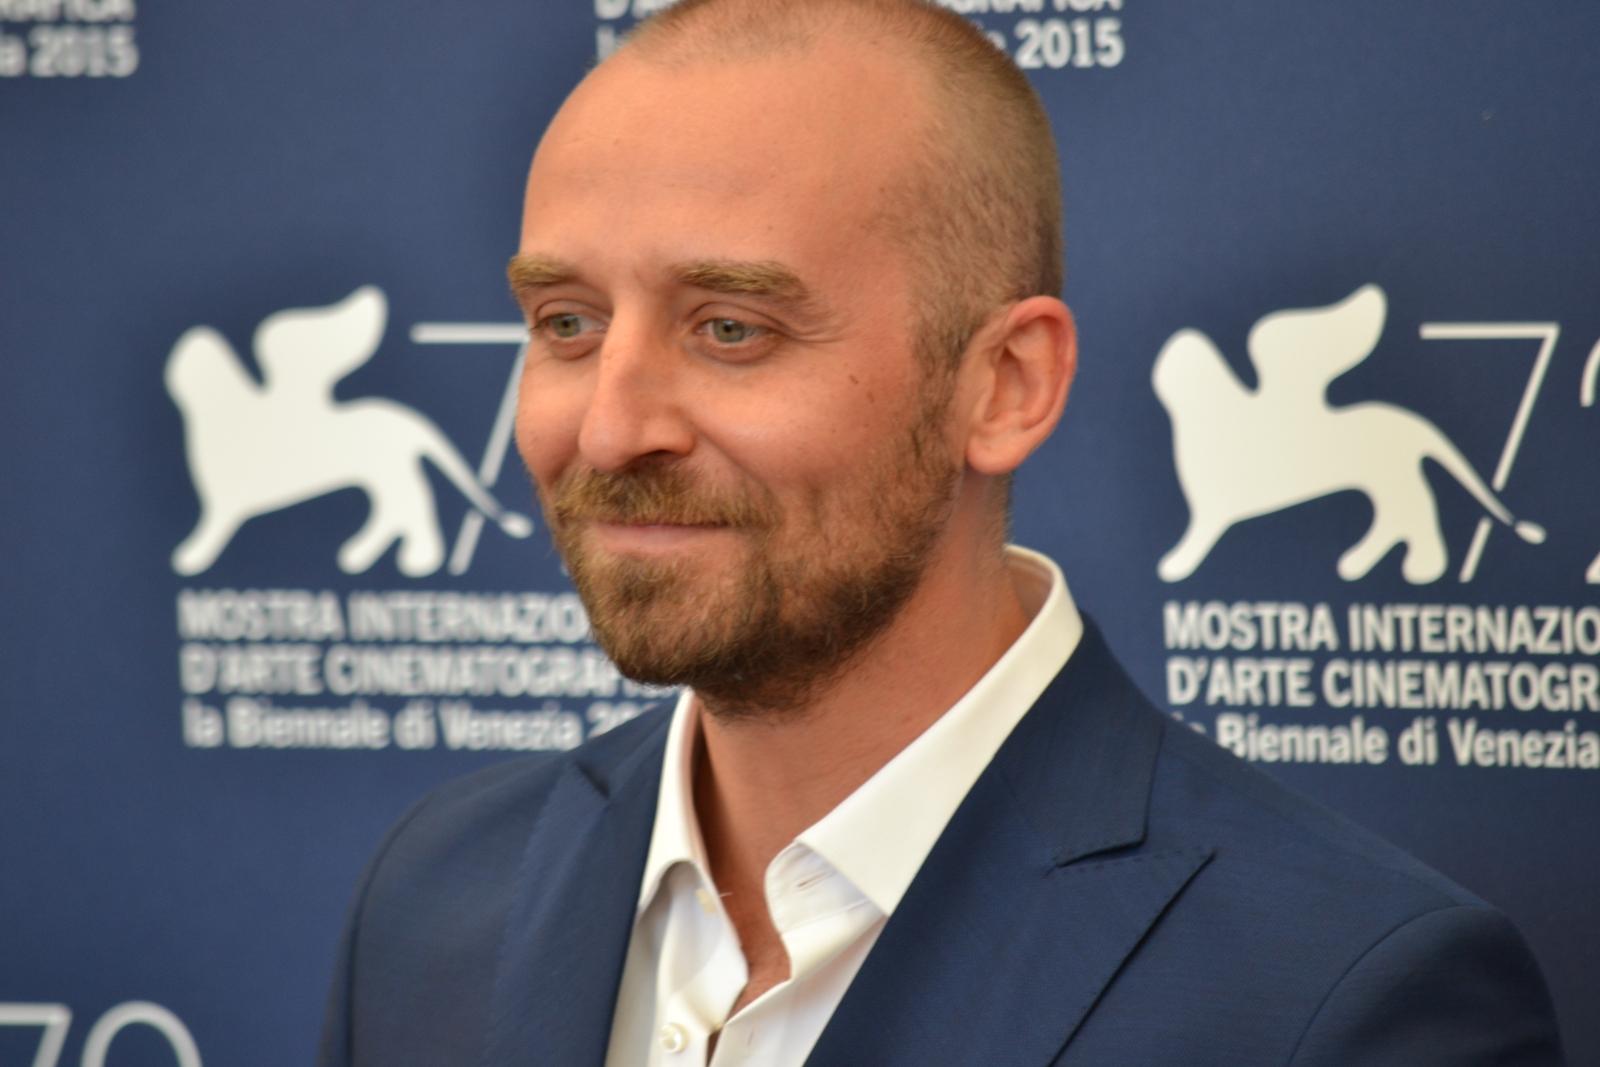 Venezia 2015: Wojciech Mecwaldowski sorride al photocall di 11 Minut